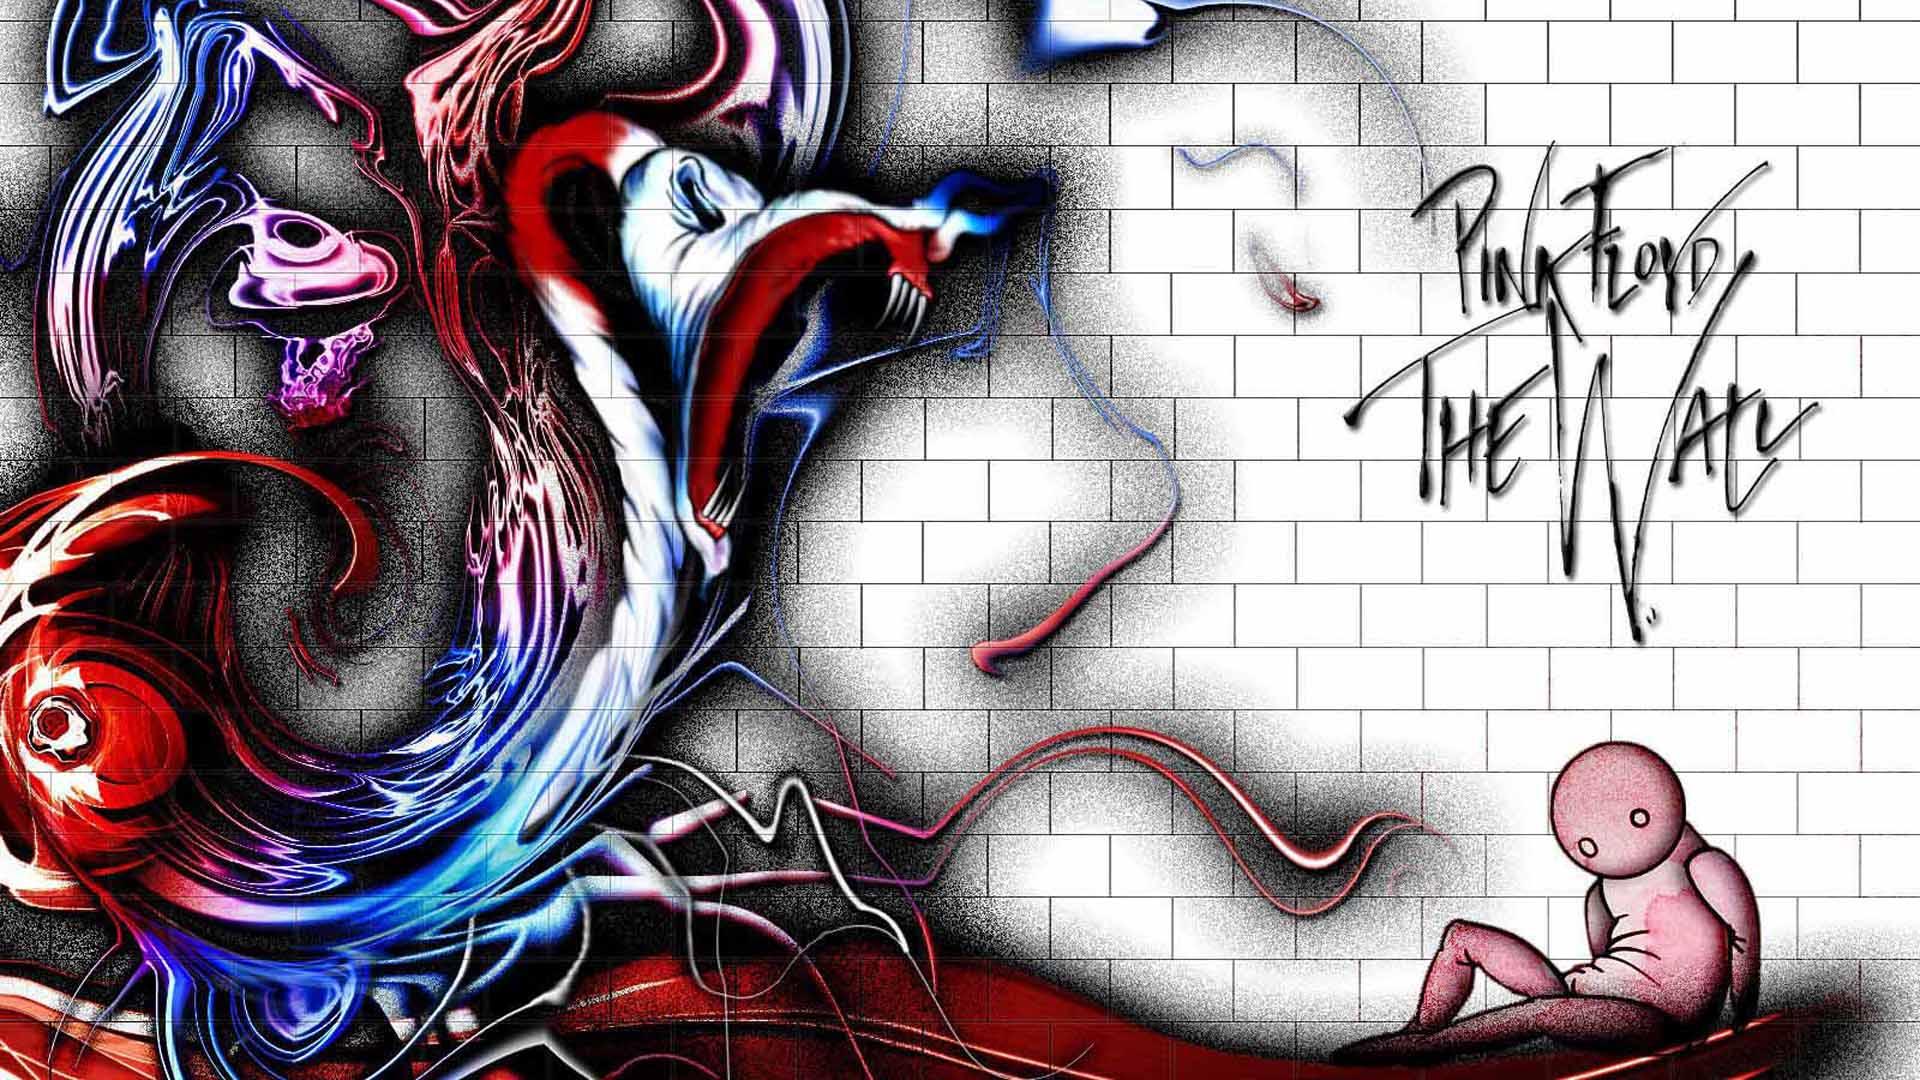 Pink Floyd Wallpaper 1920x1080 Wallpapers 1920x1080 Wallpapers 1920x1080